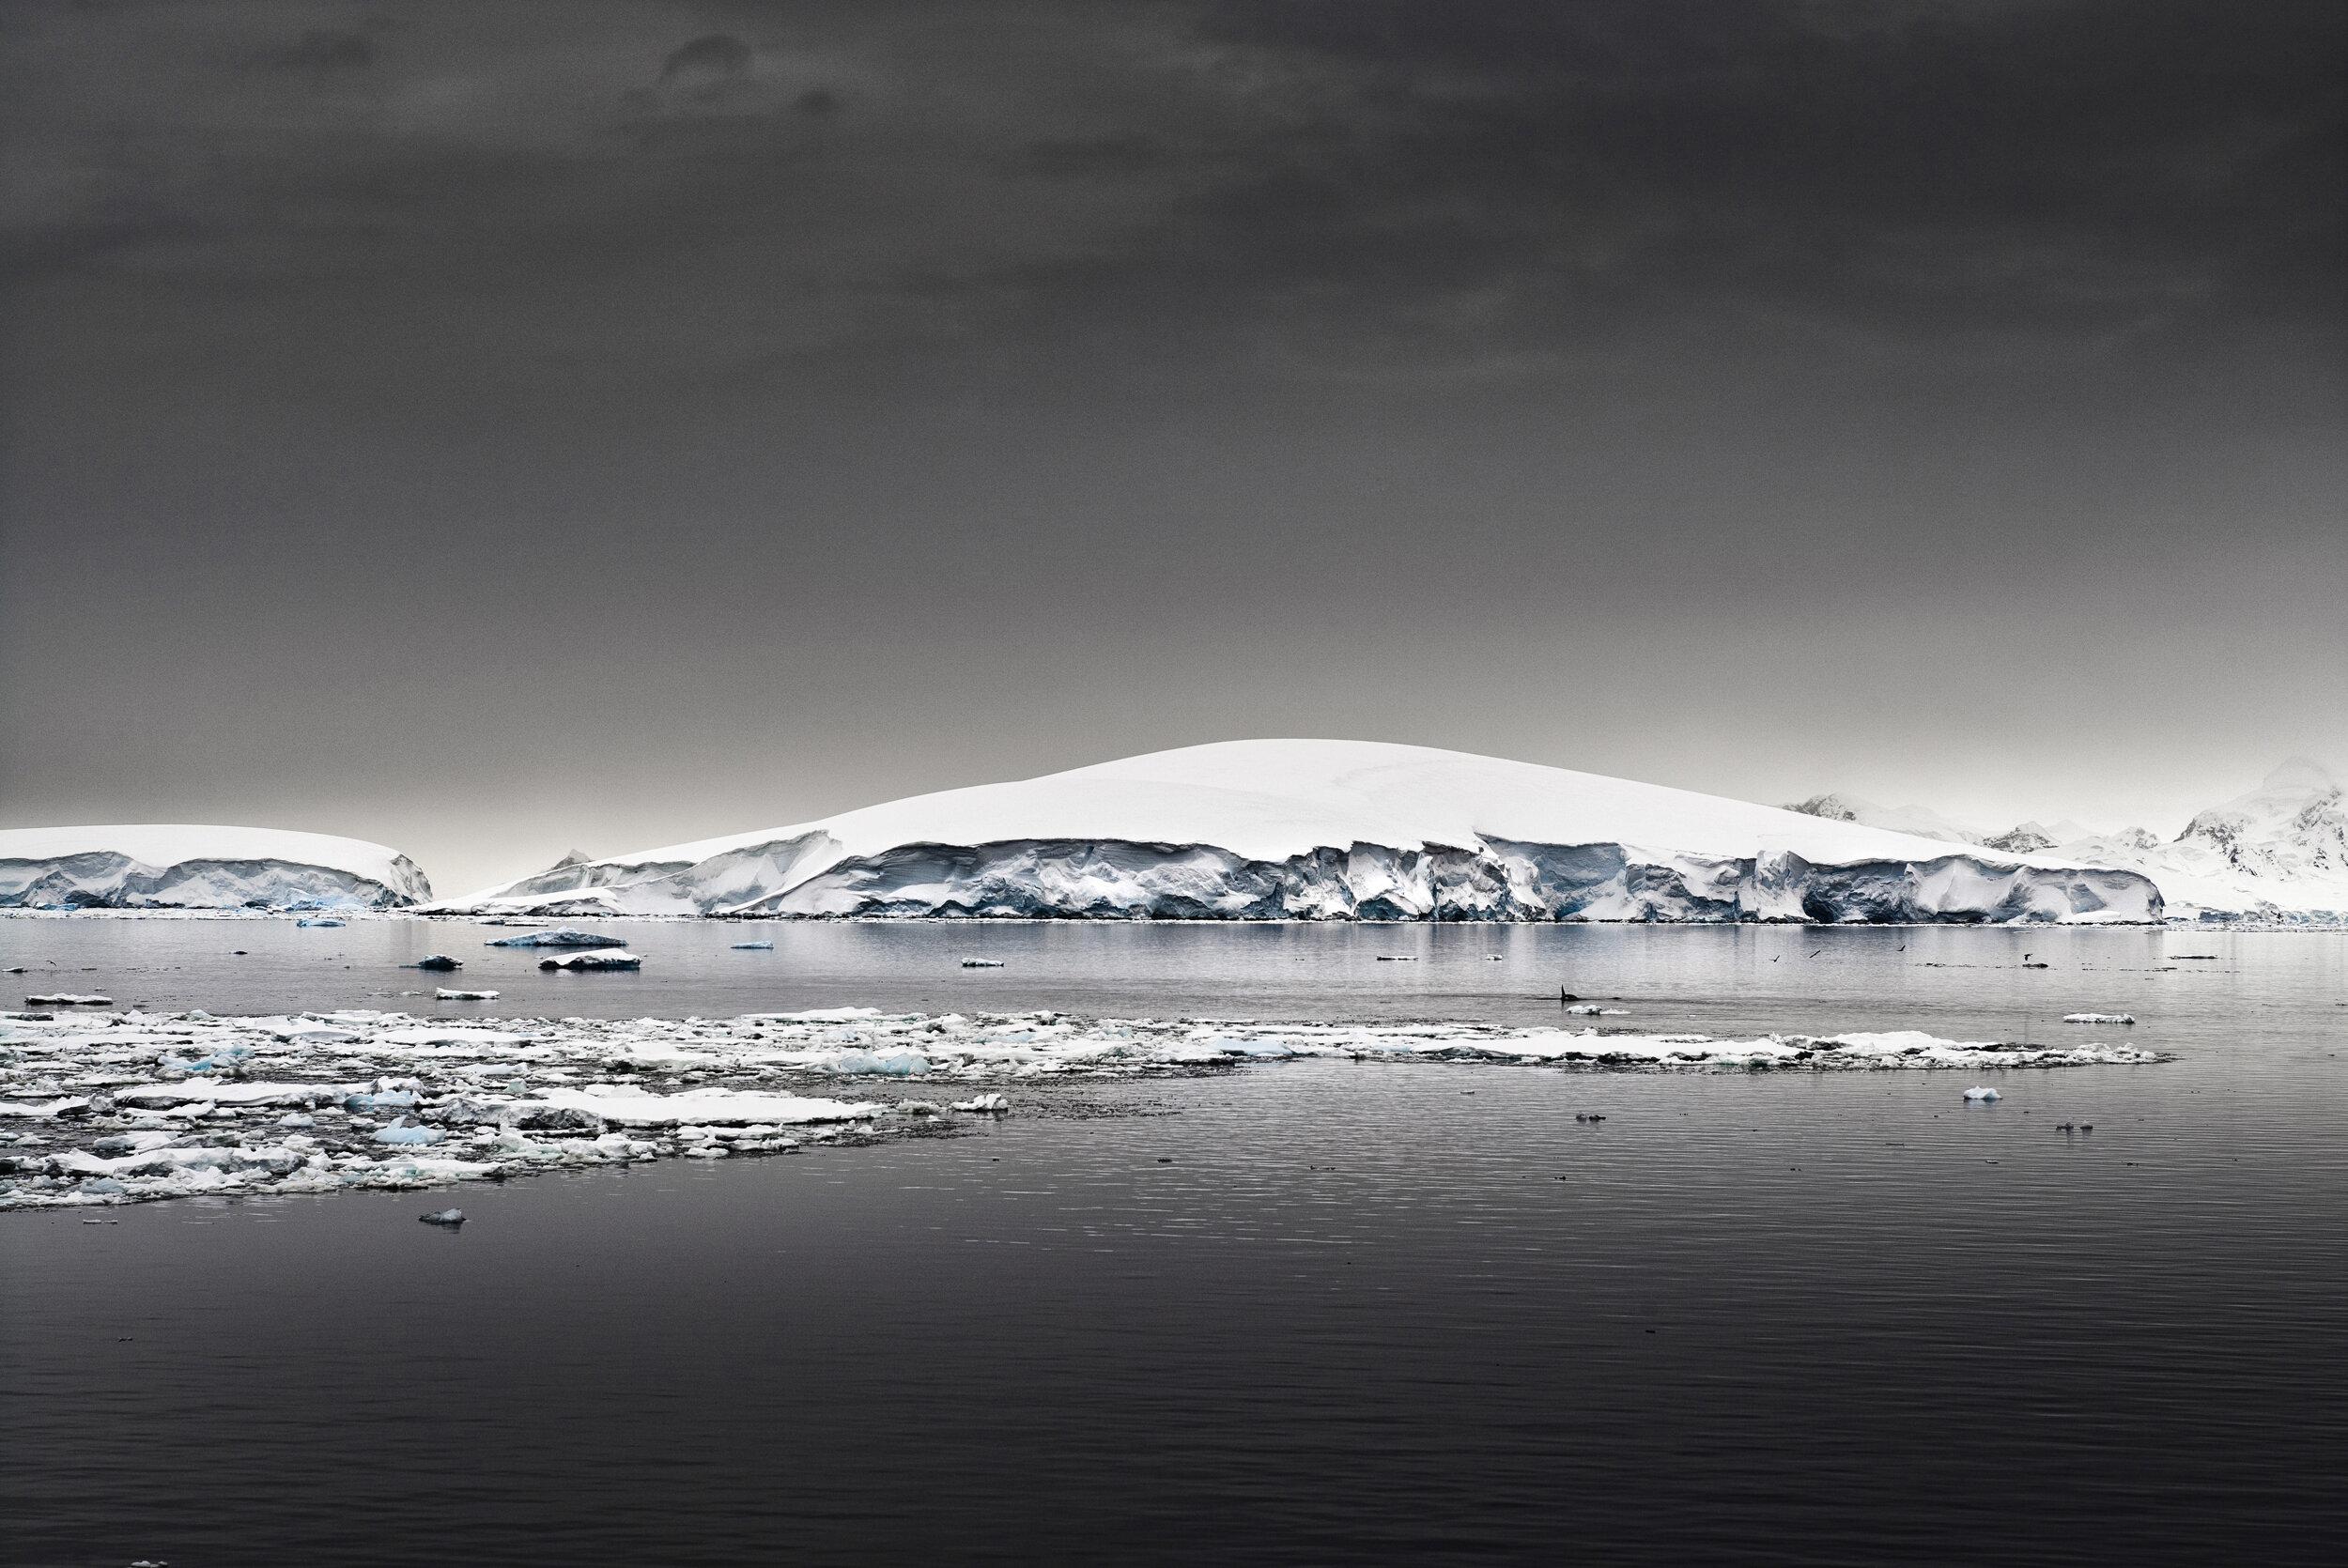 manuel_uebler_antarctica_twilight_002.jpg